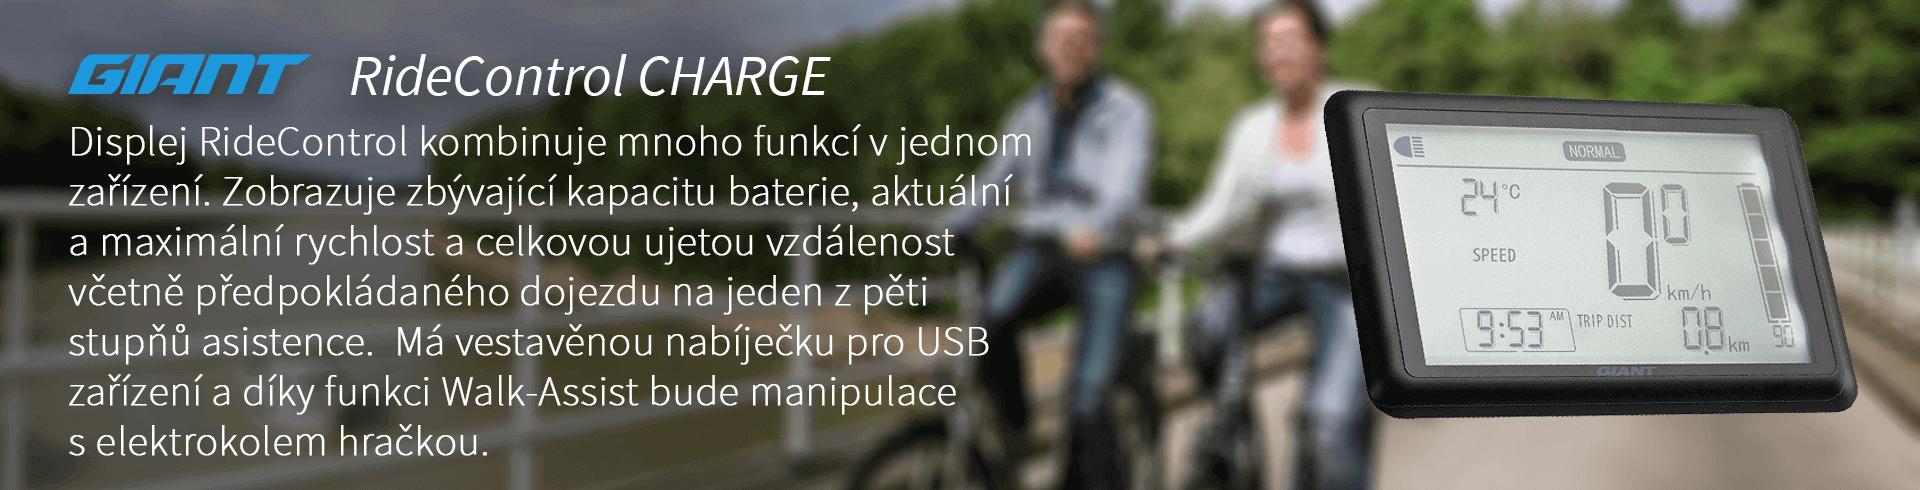 Displej RideControl Charge